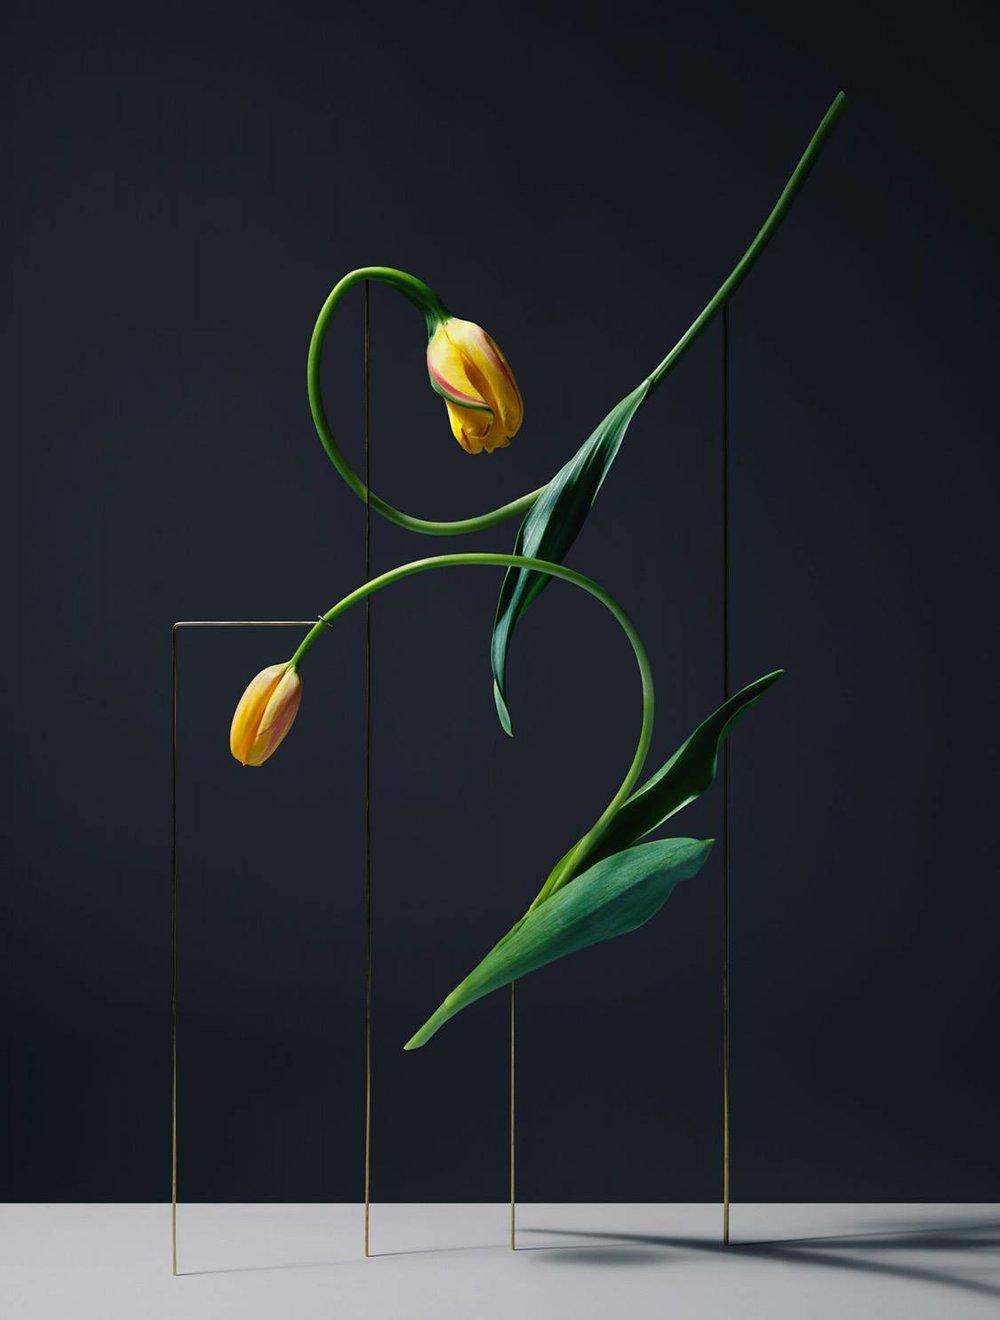 _09272017_Floral Inspo.jpg